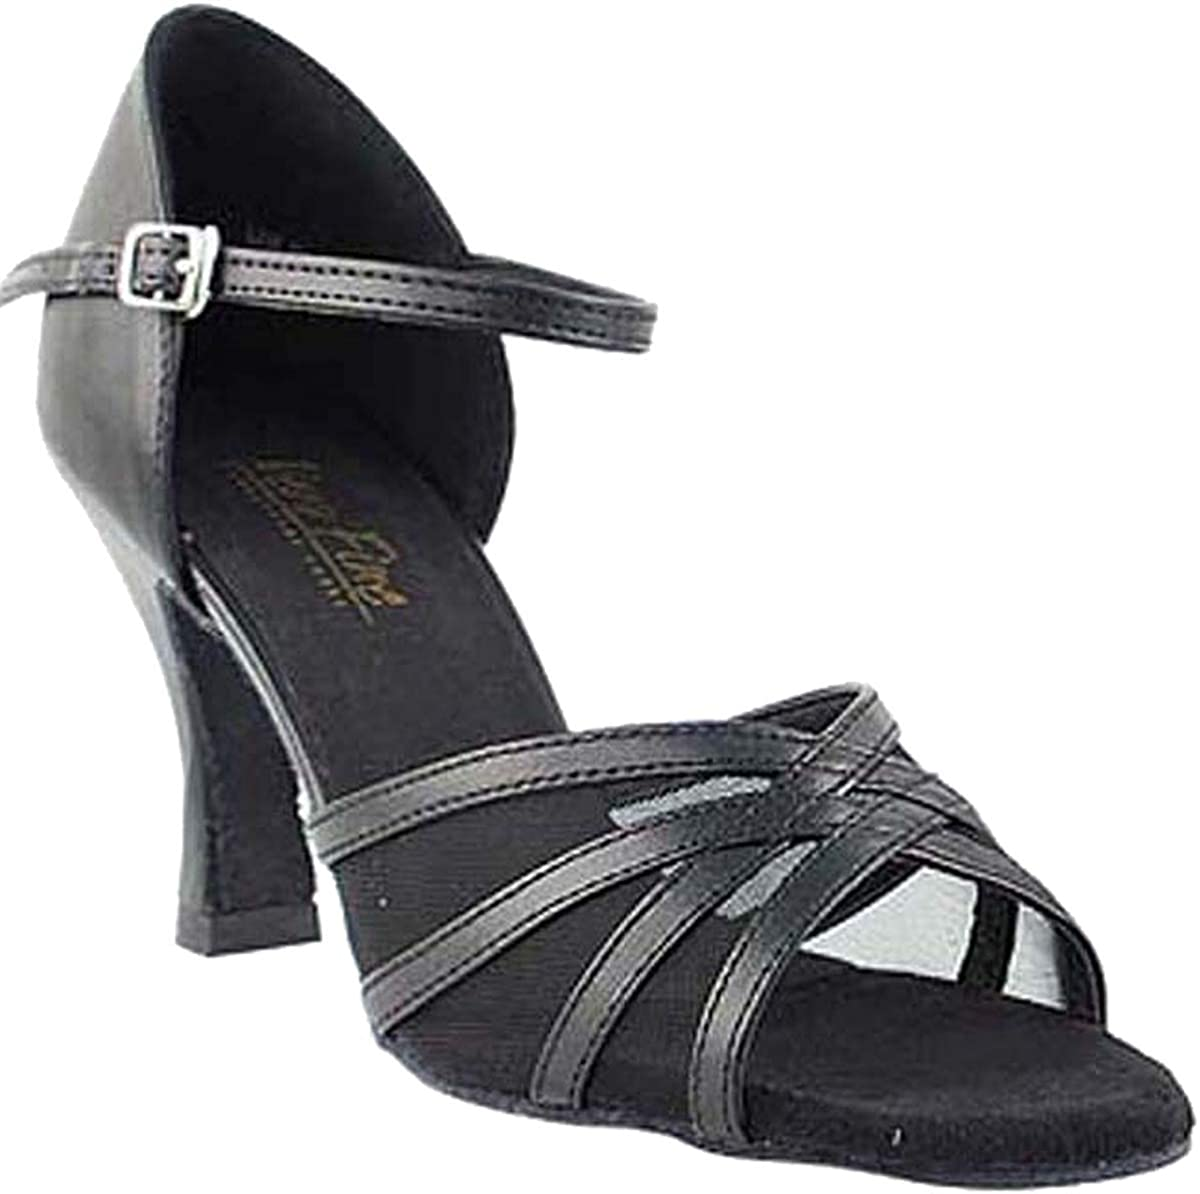 Women's Ballroom Time sale Ranking TOP2 Dance Shoes Tango Co 6027EB Wedding Salsa